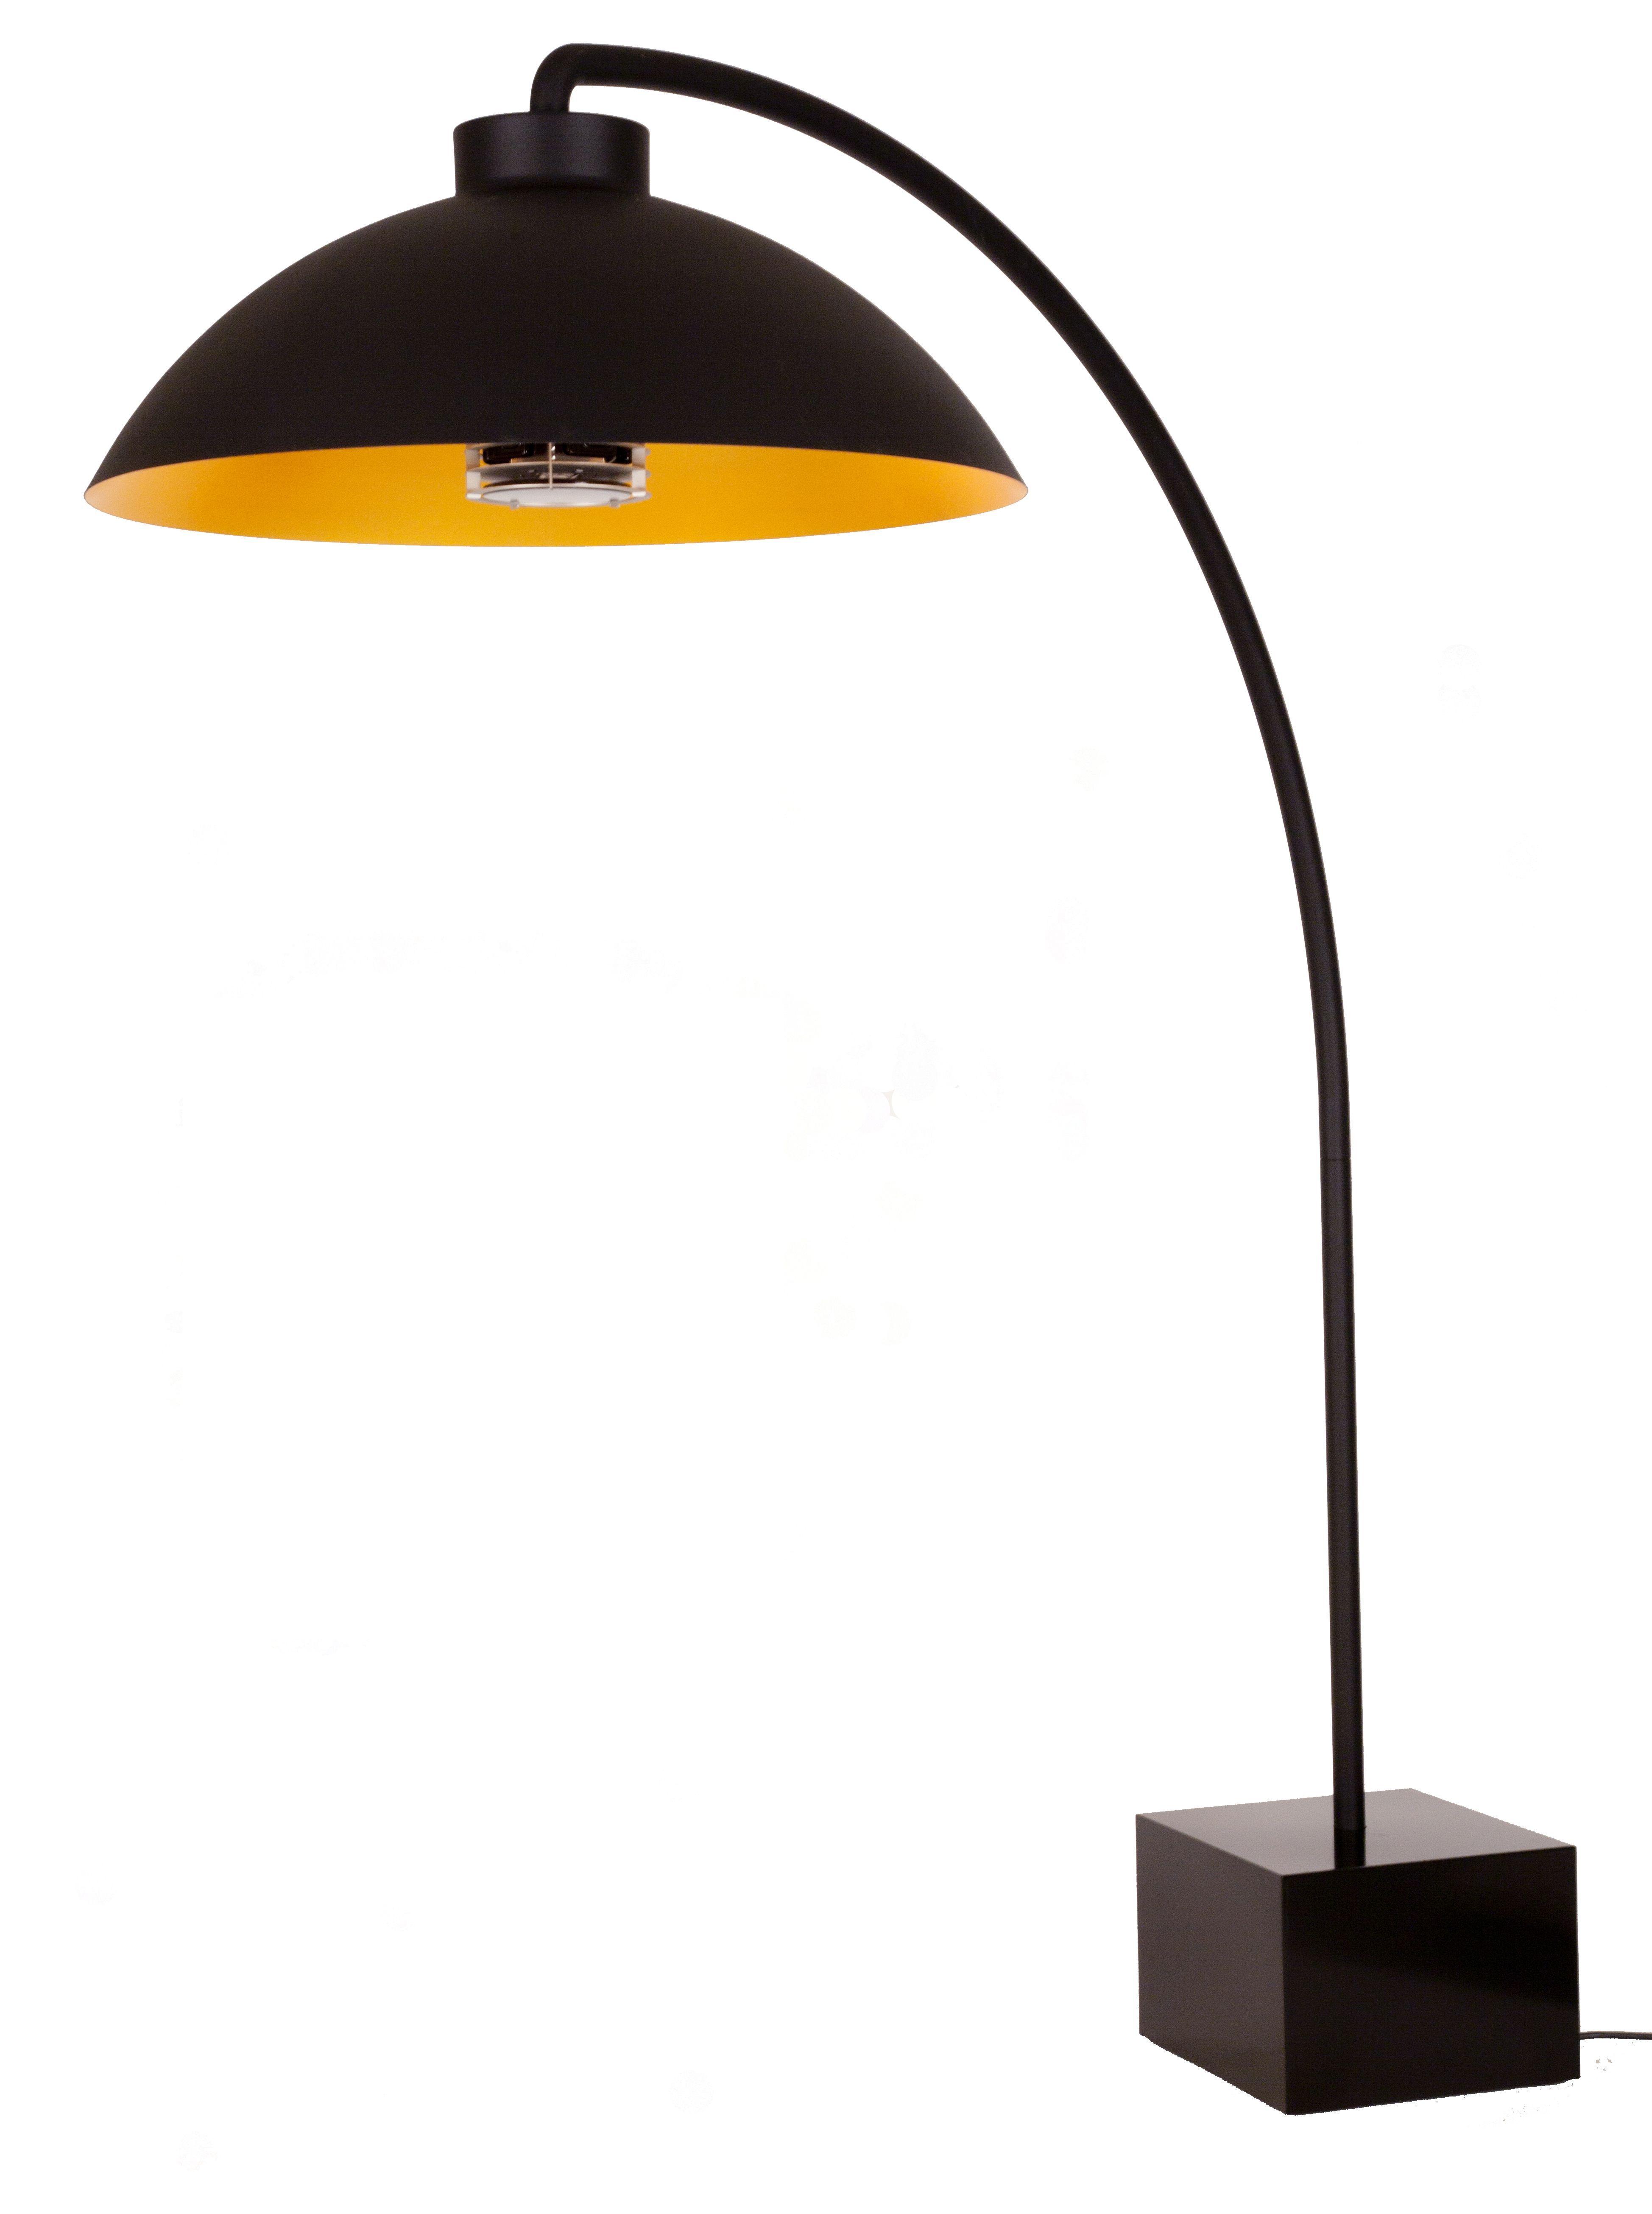 Outdoor Electric Heat Lamp